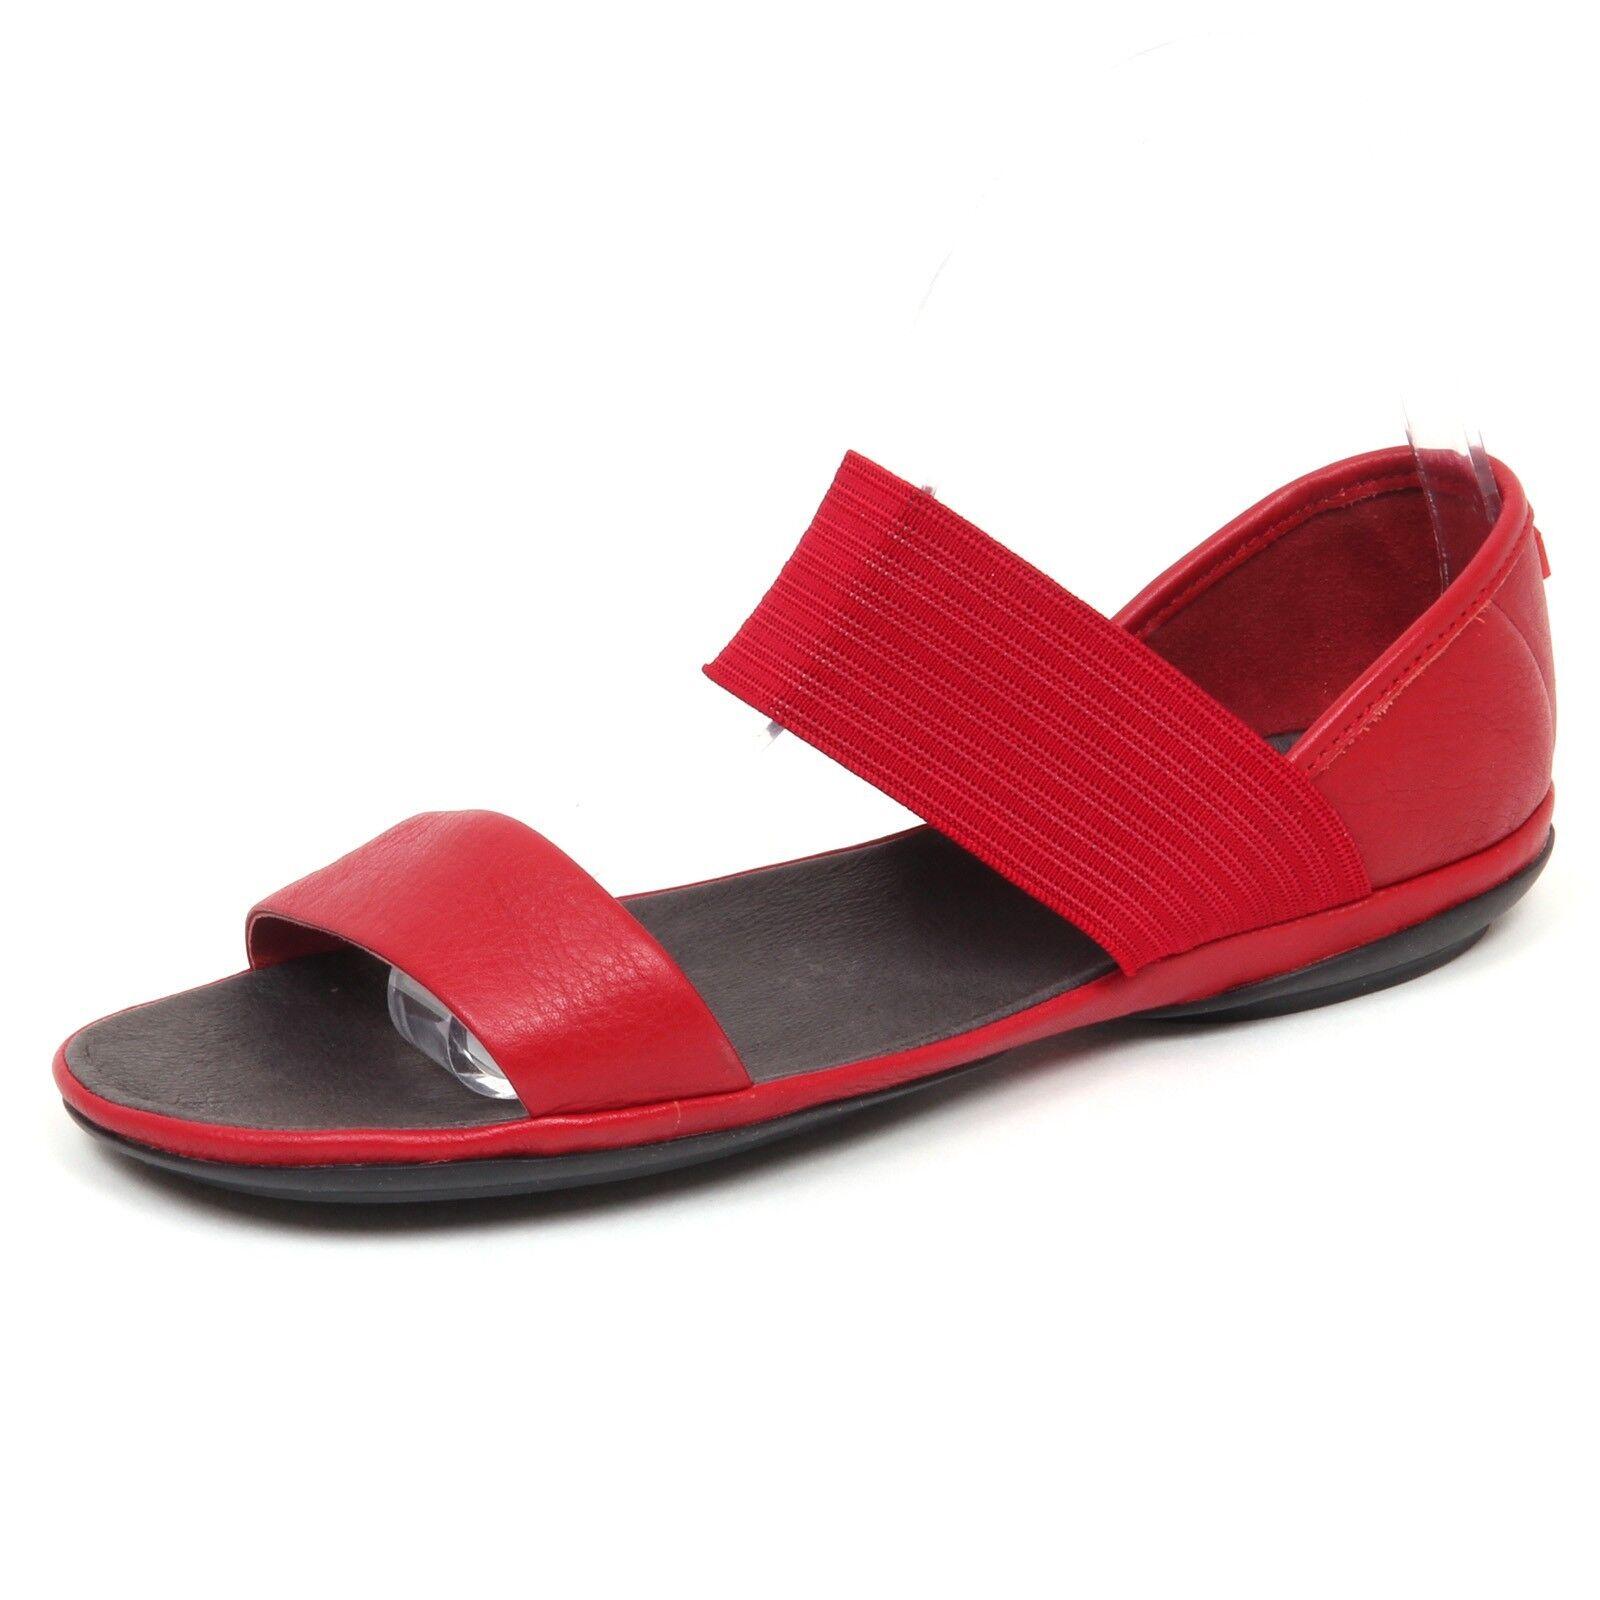 E5800 (utan ask) Sandalo kvinnor röd Camper skor skor Sandal kvinna